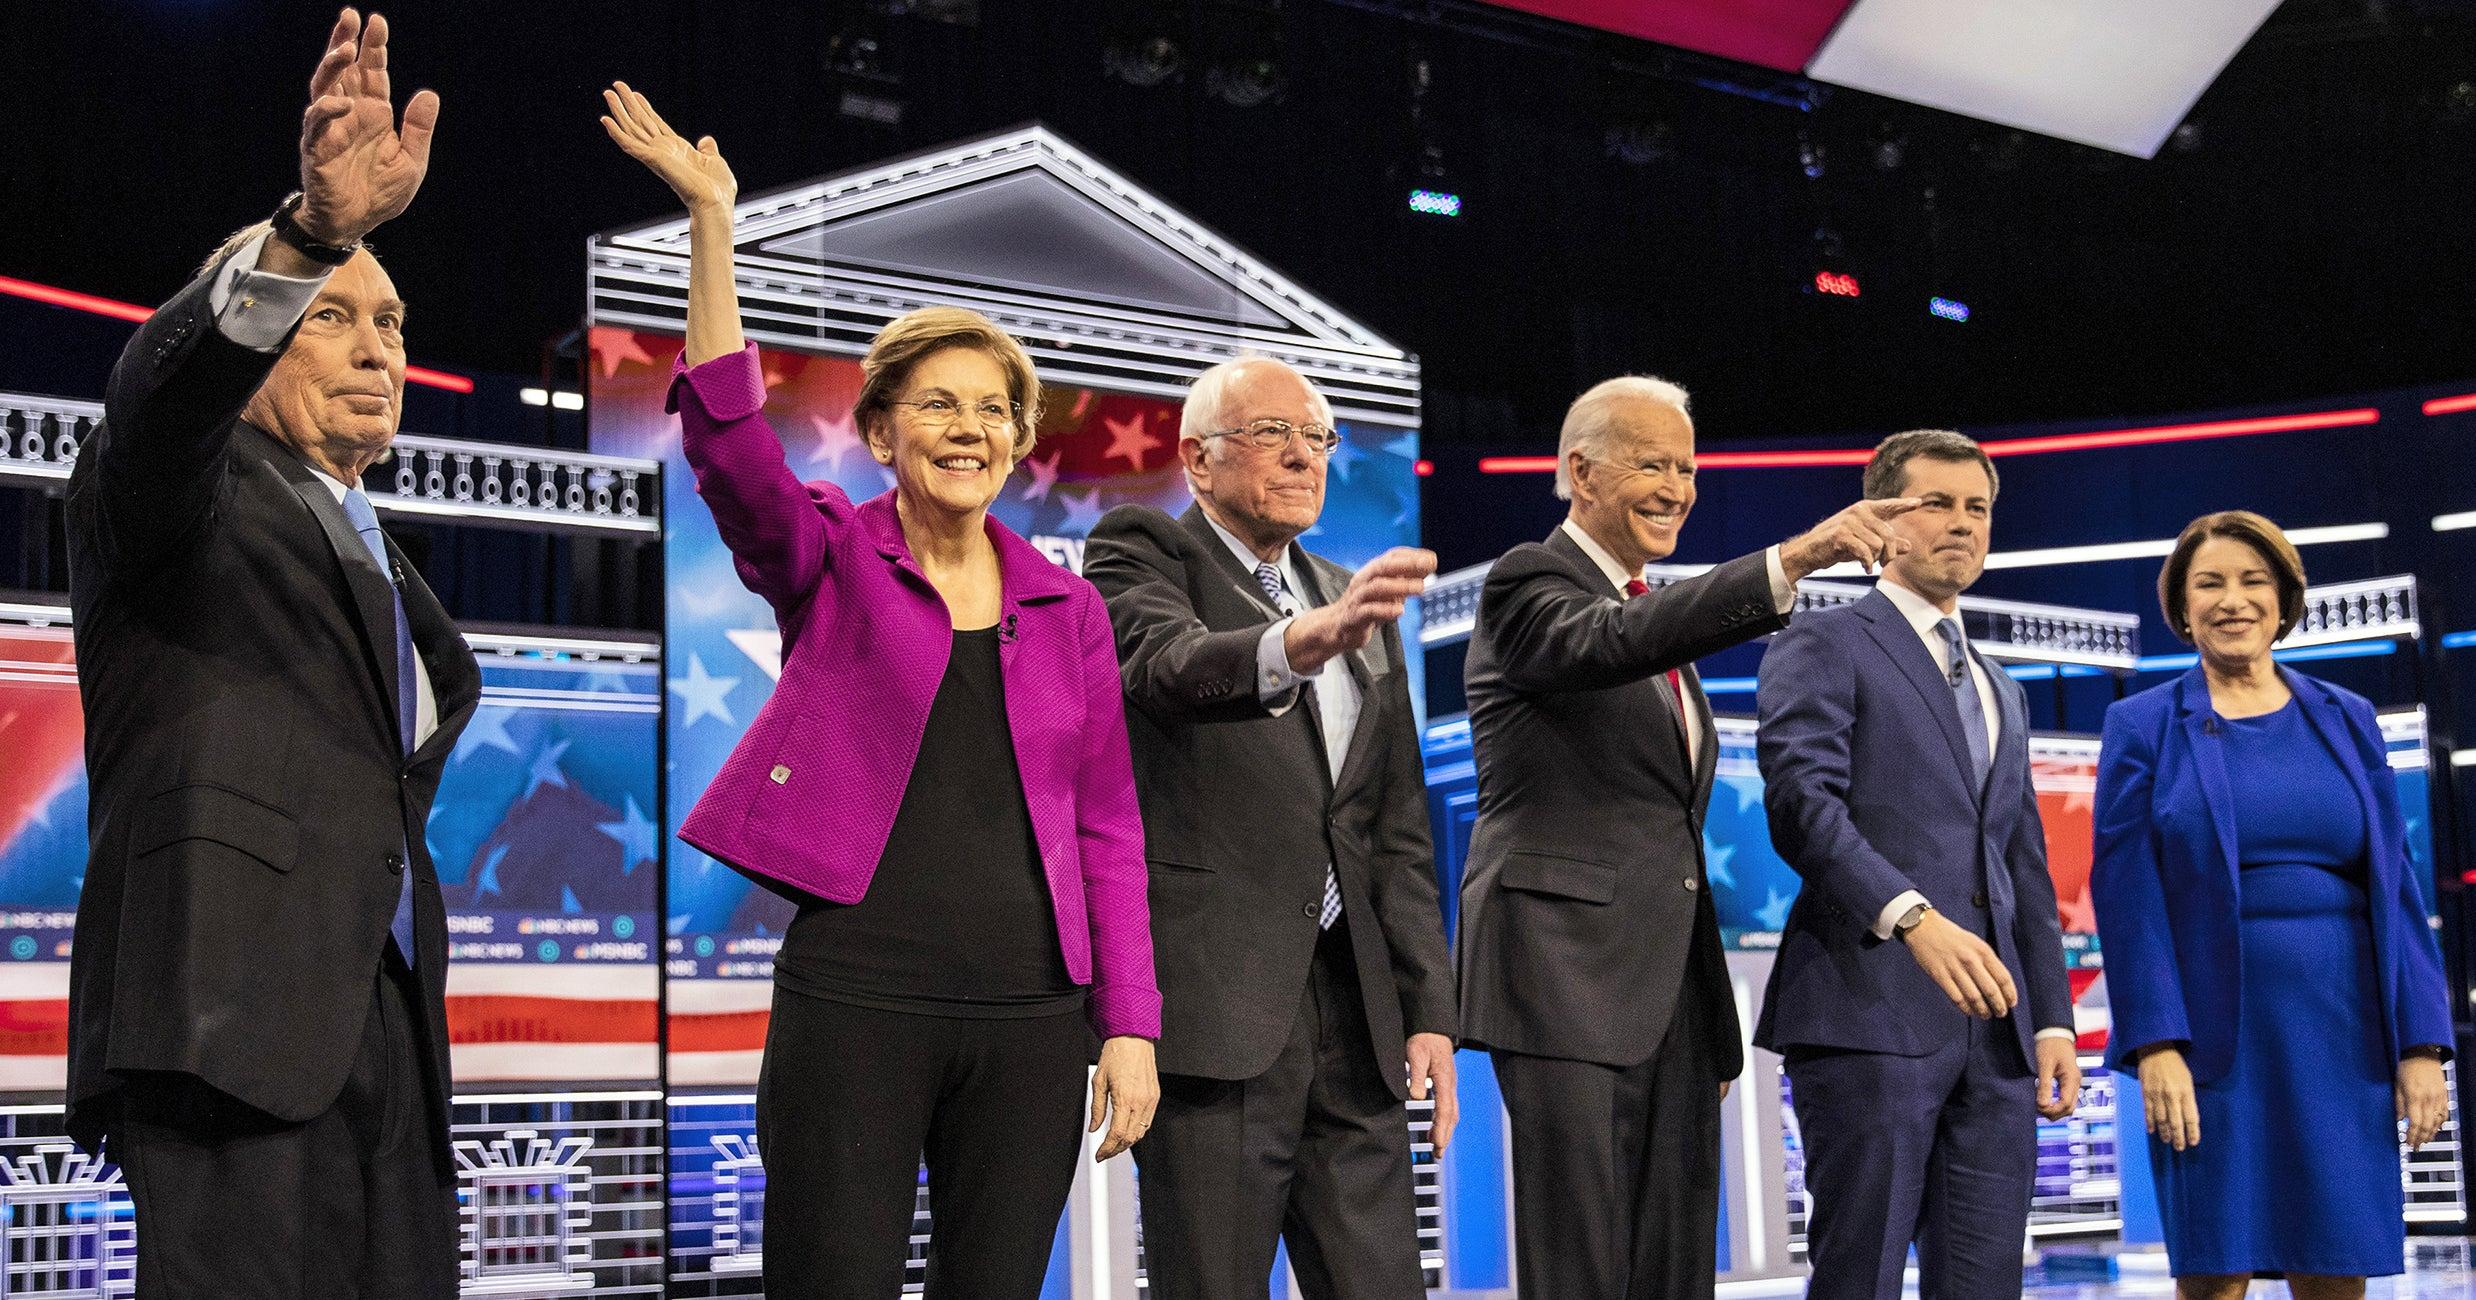 The South Carolina Democratic Debate Is Bringing The Heat